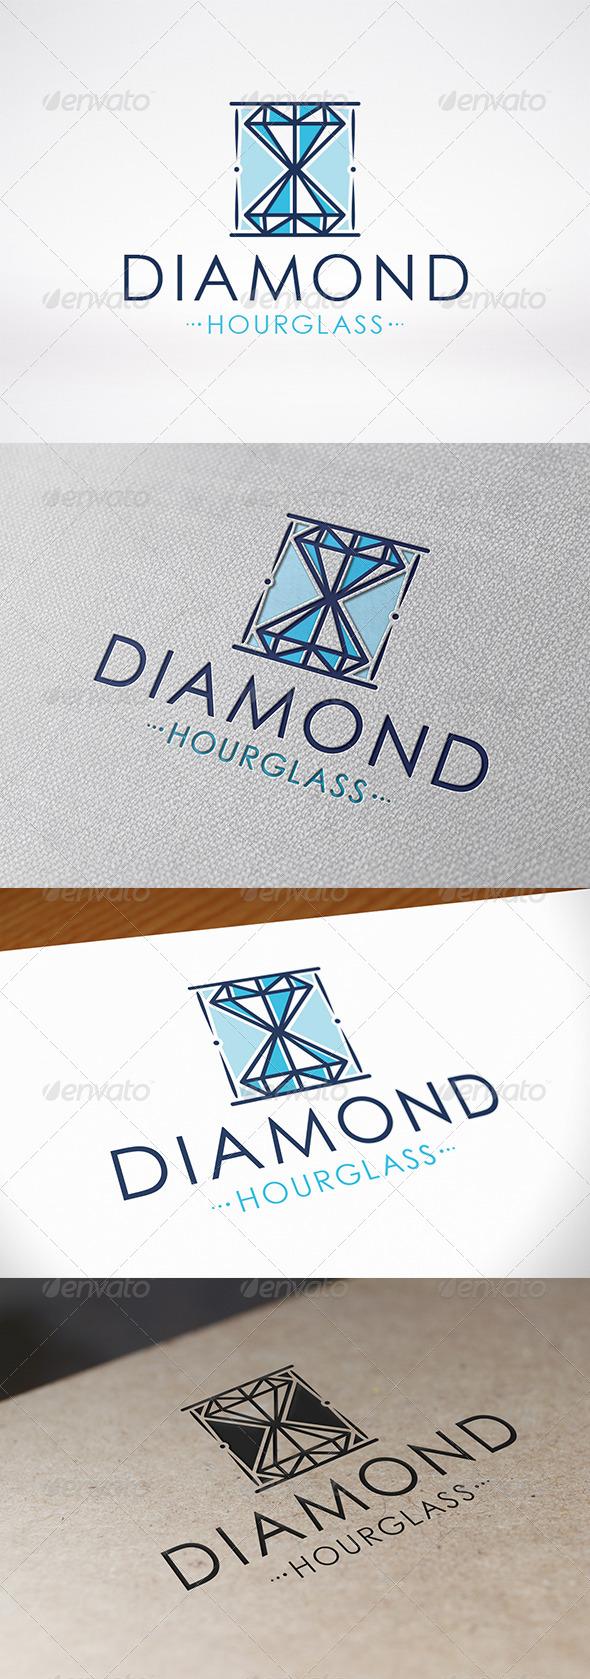 Diamond Hourglass Logo - Objects Logo Templates